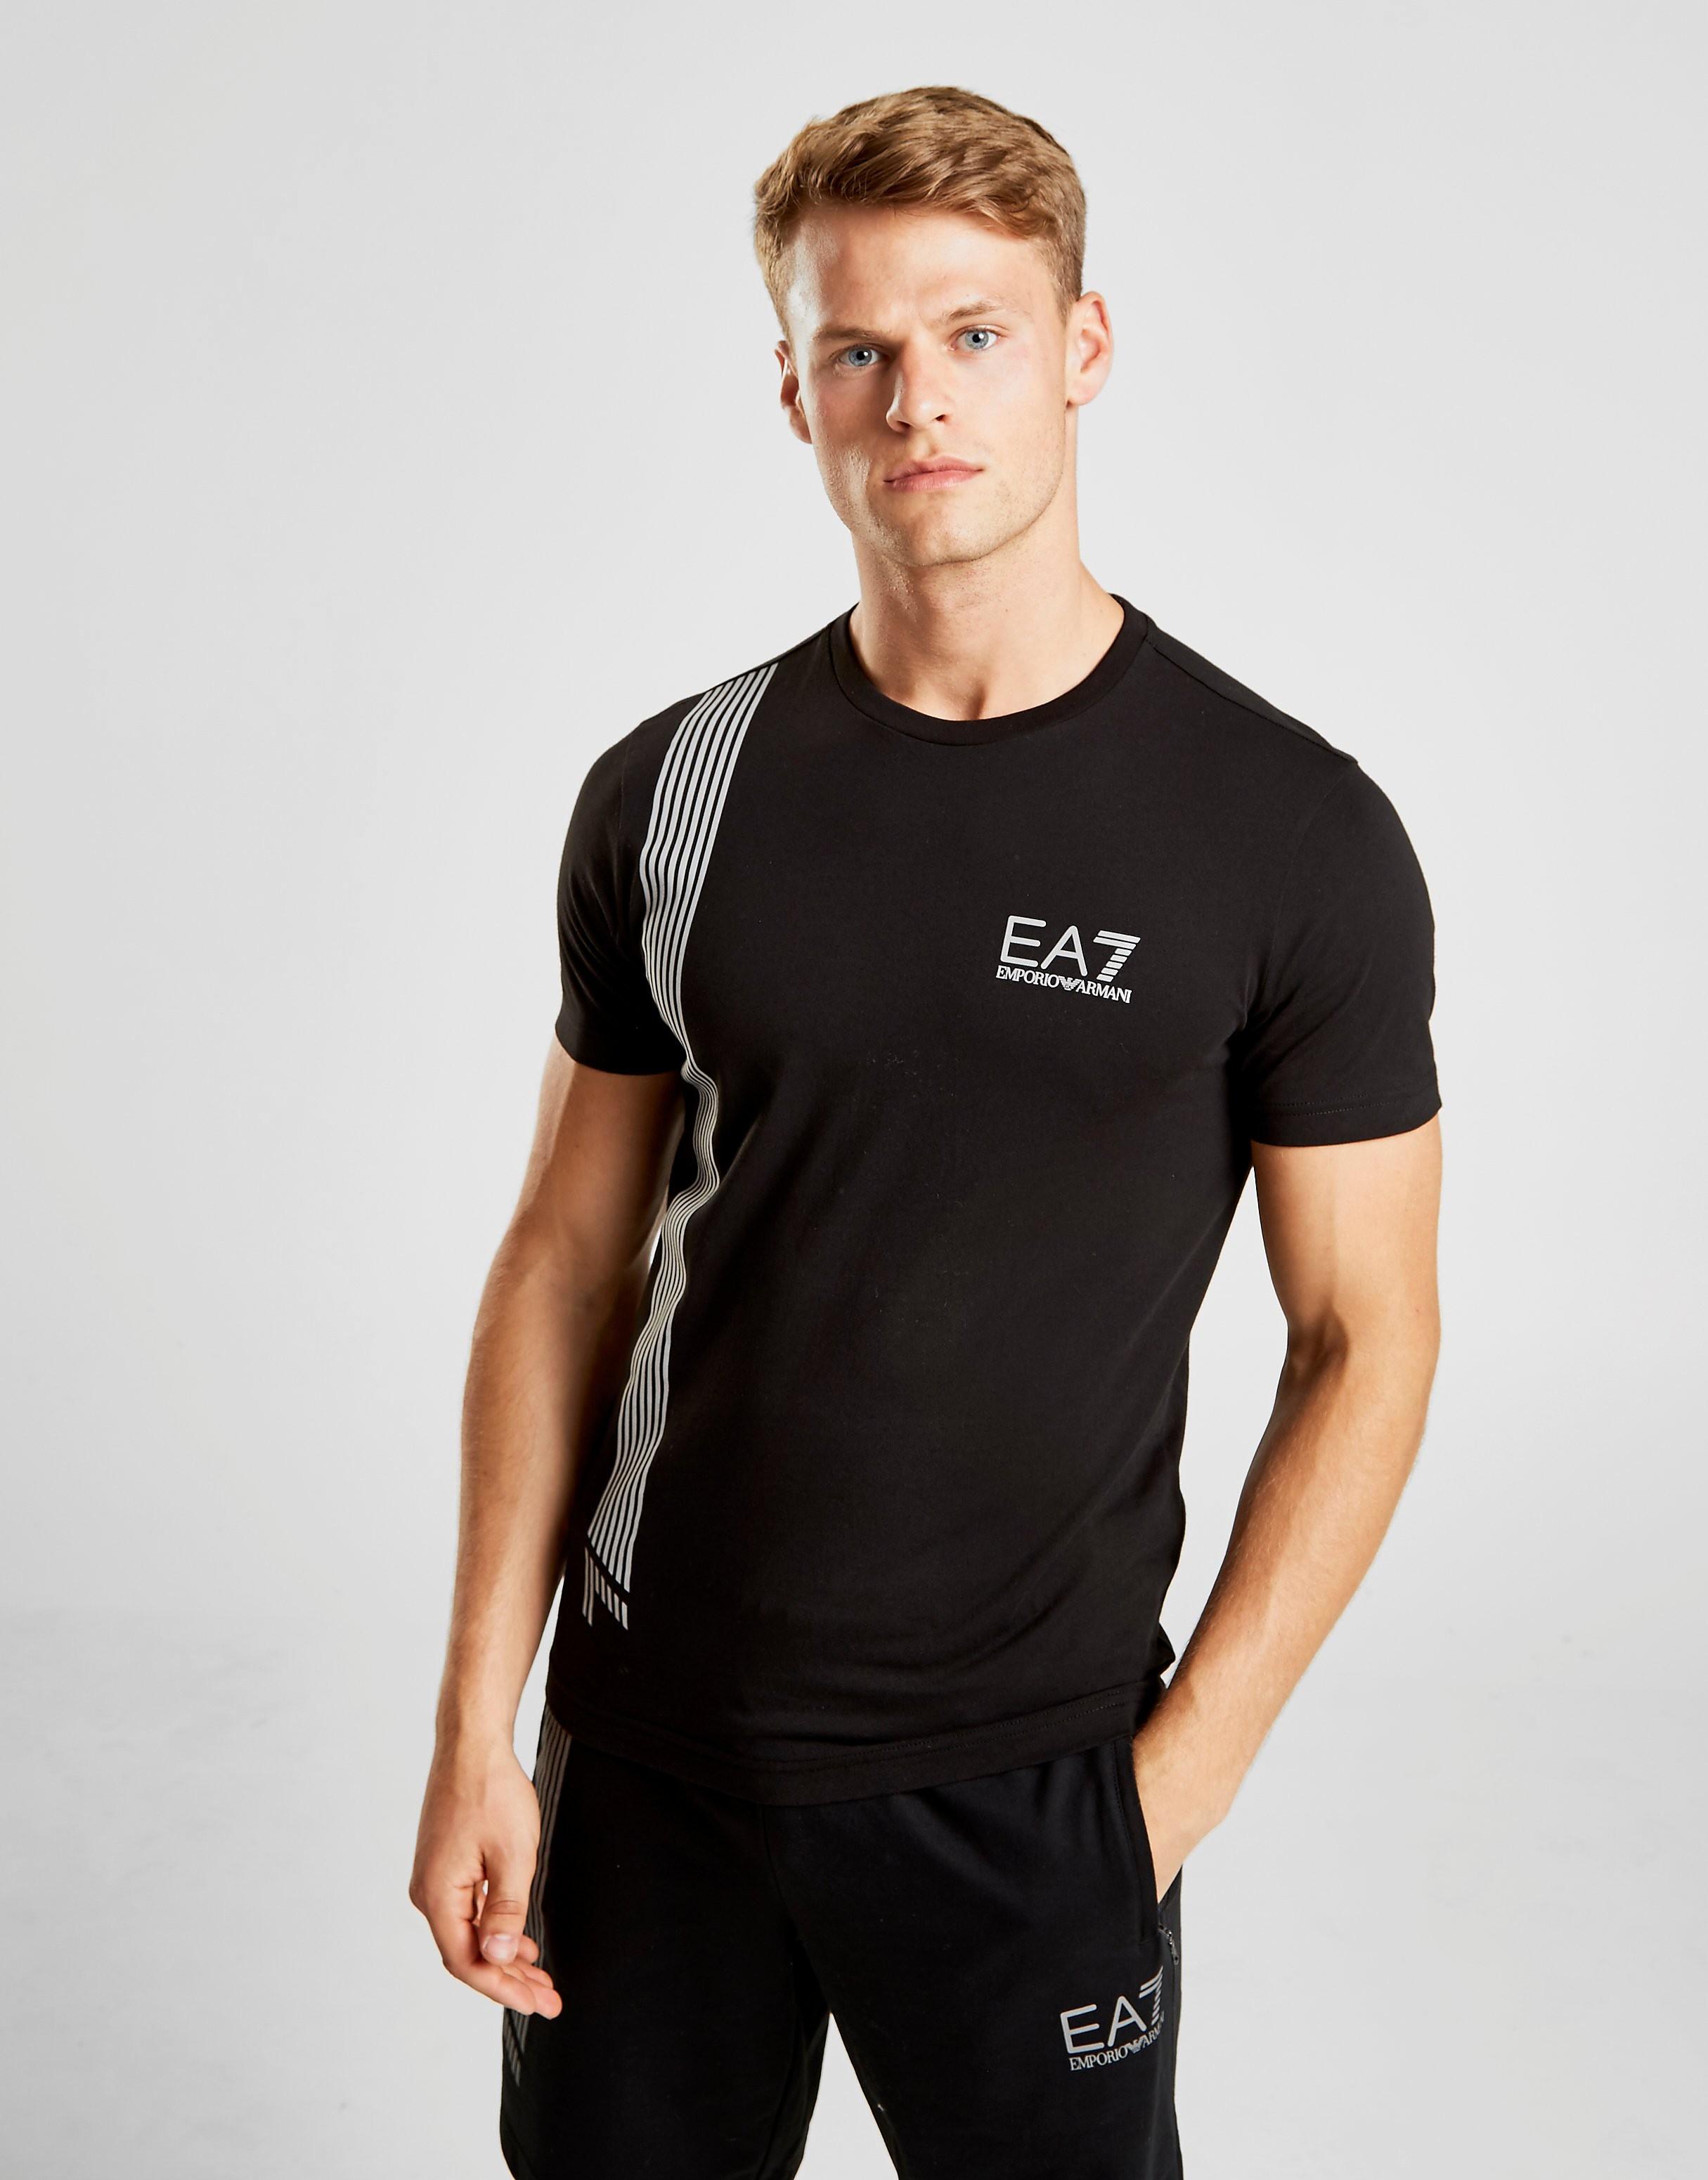 Emporio Armani EA7 7 Lines Kortærmet T-Shirt Herre